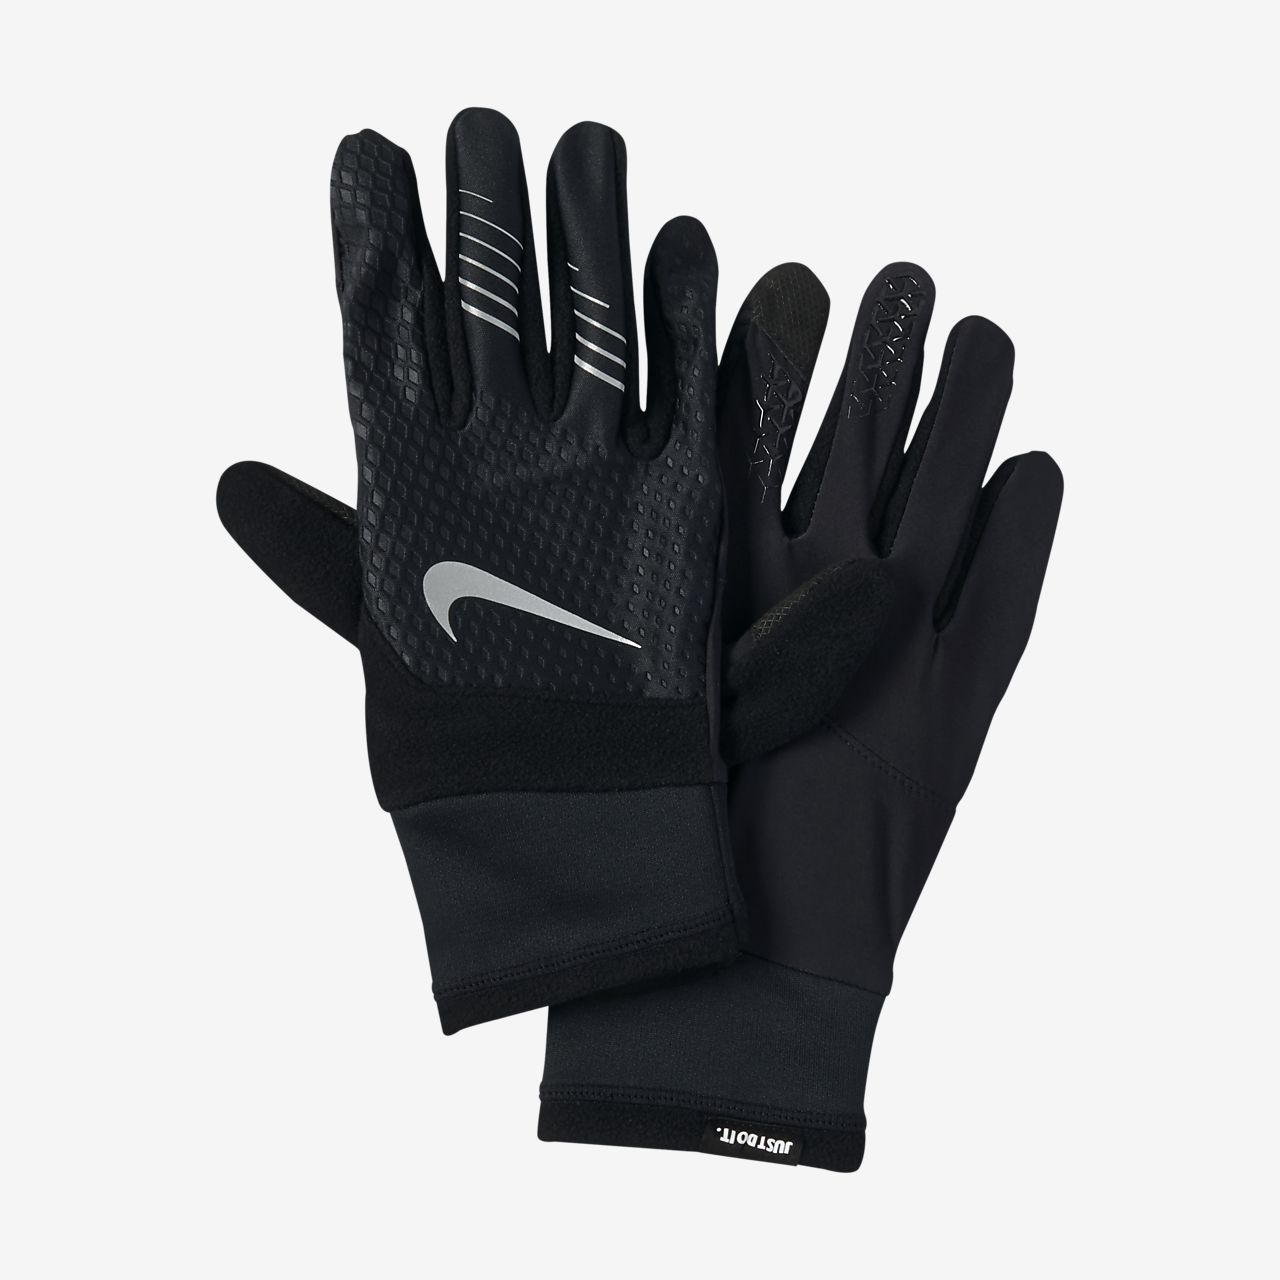 nike pullover kinder, Nike Therma Fit Elite